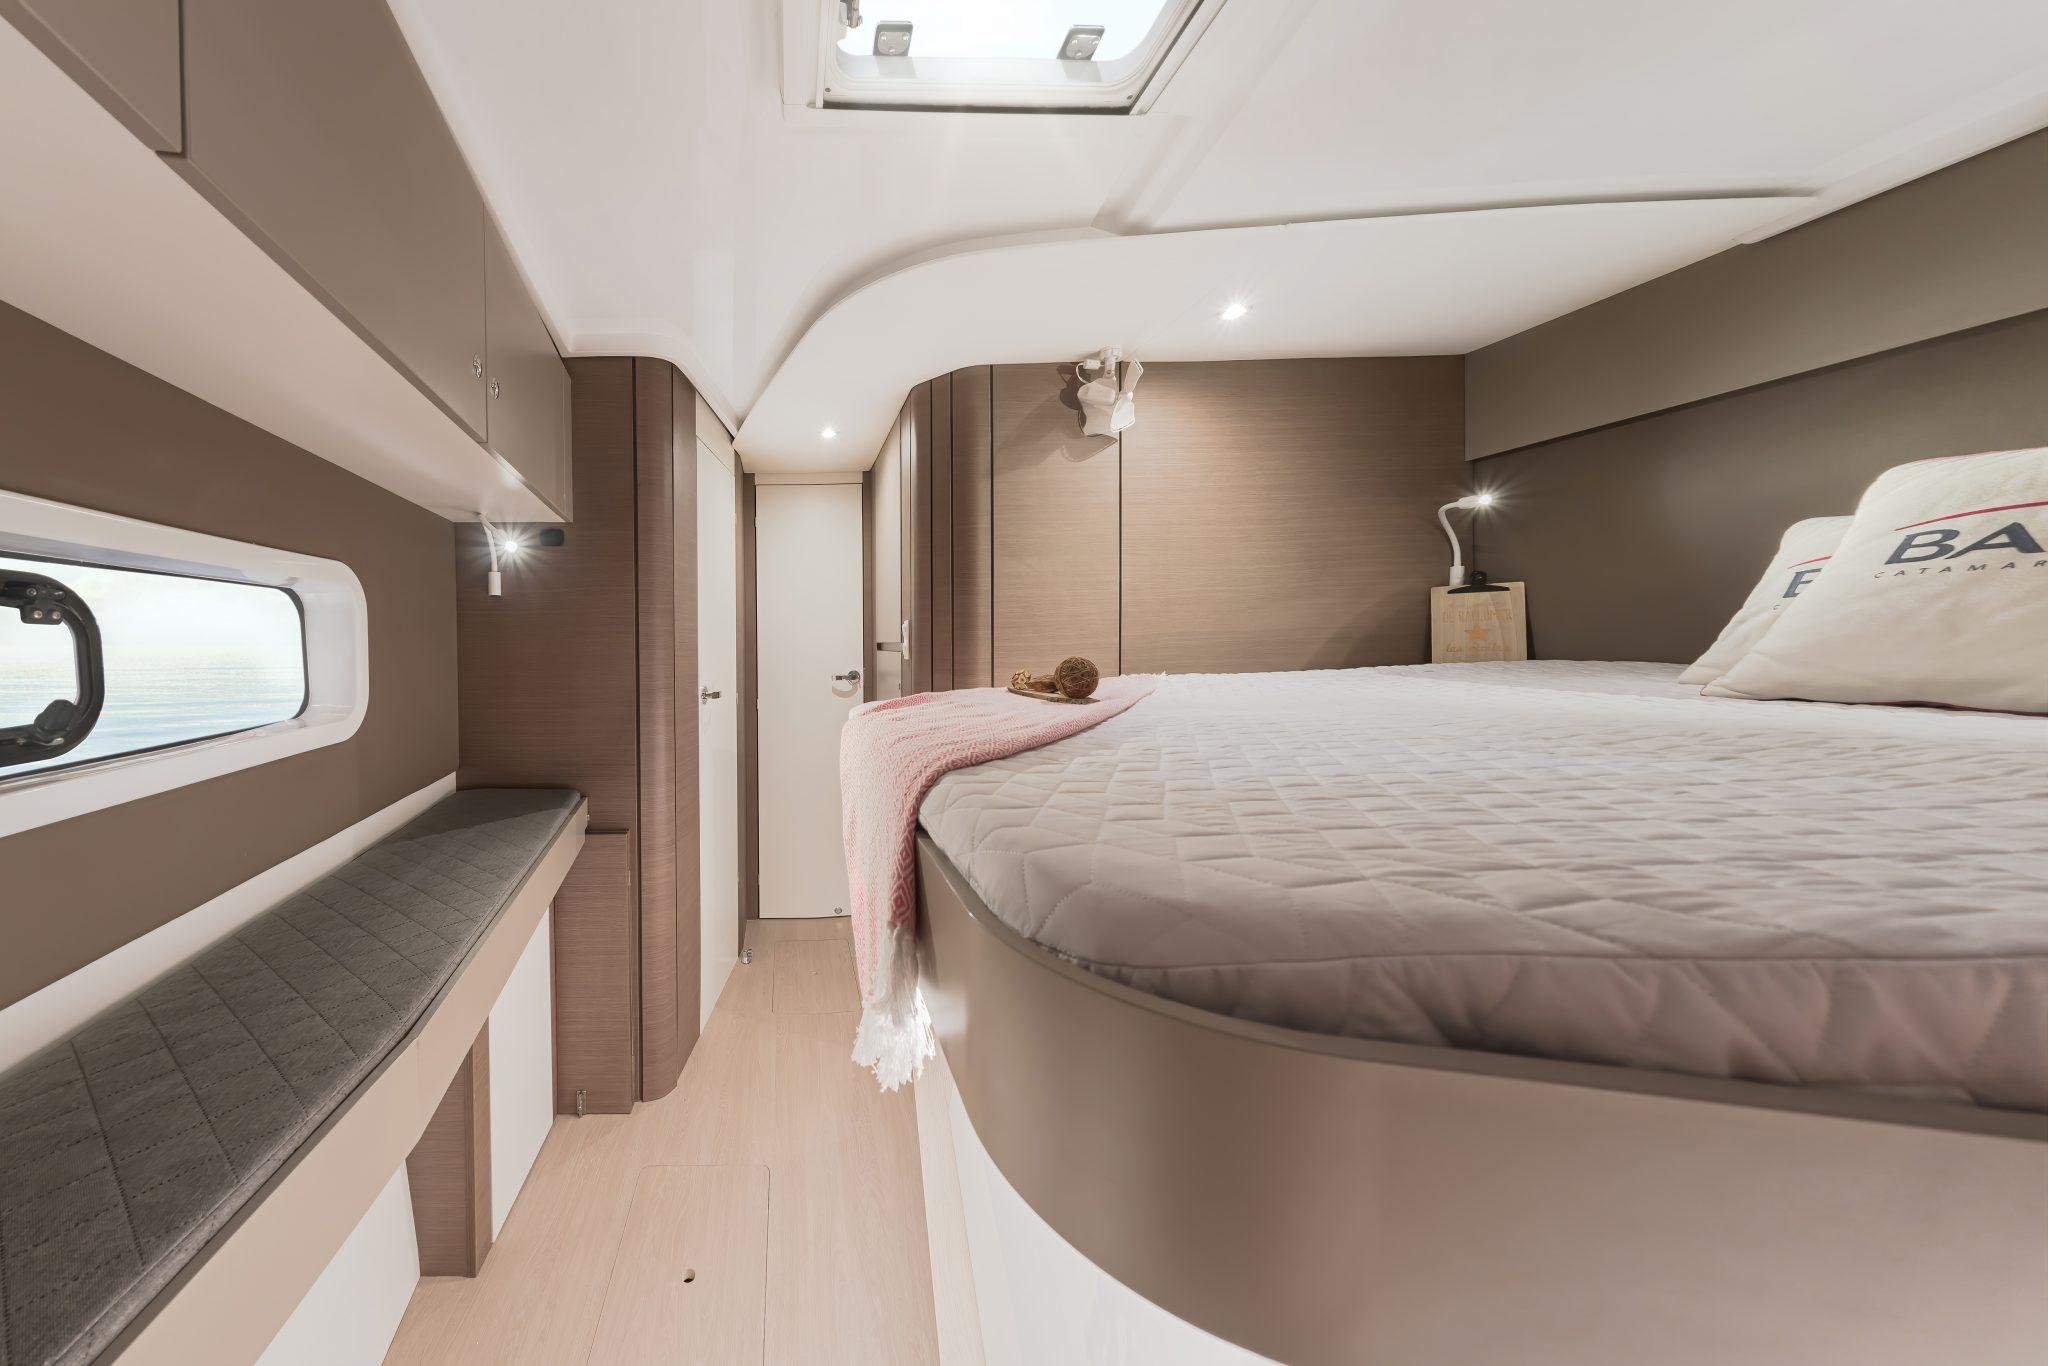 bali-catspace-cabin_3